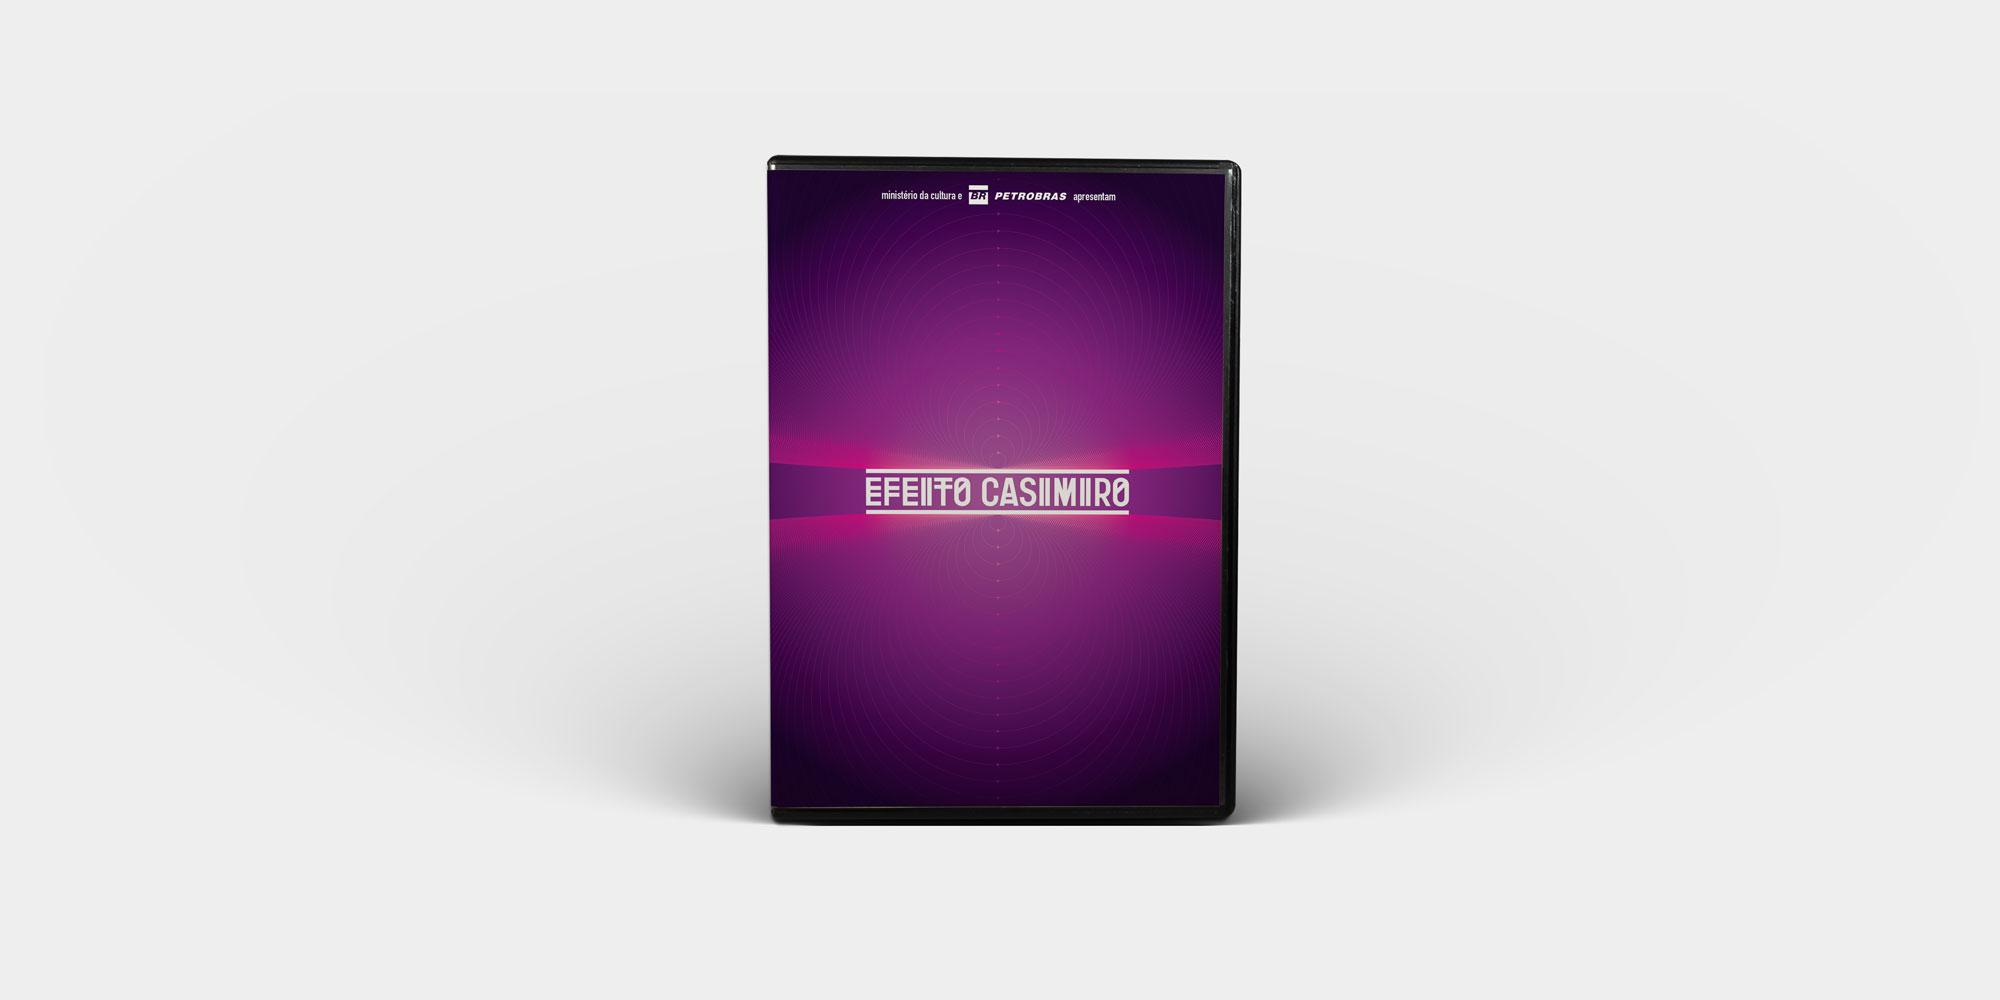 EfeitoCasmiro-dvd-case-and-disk-mockups—01